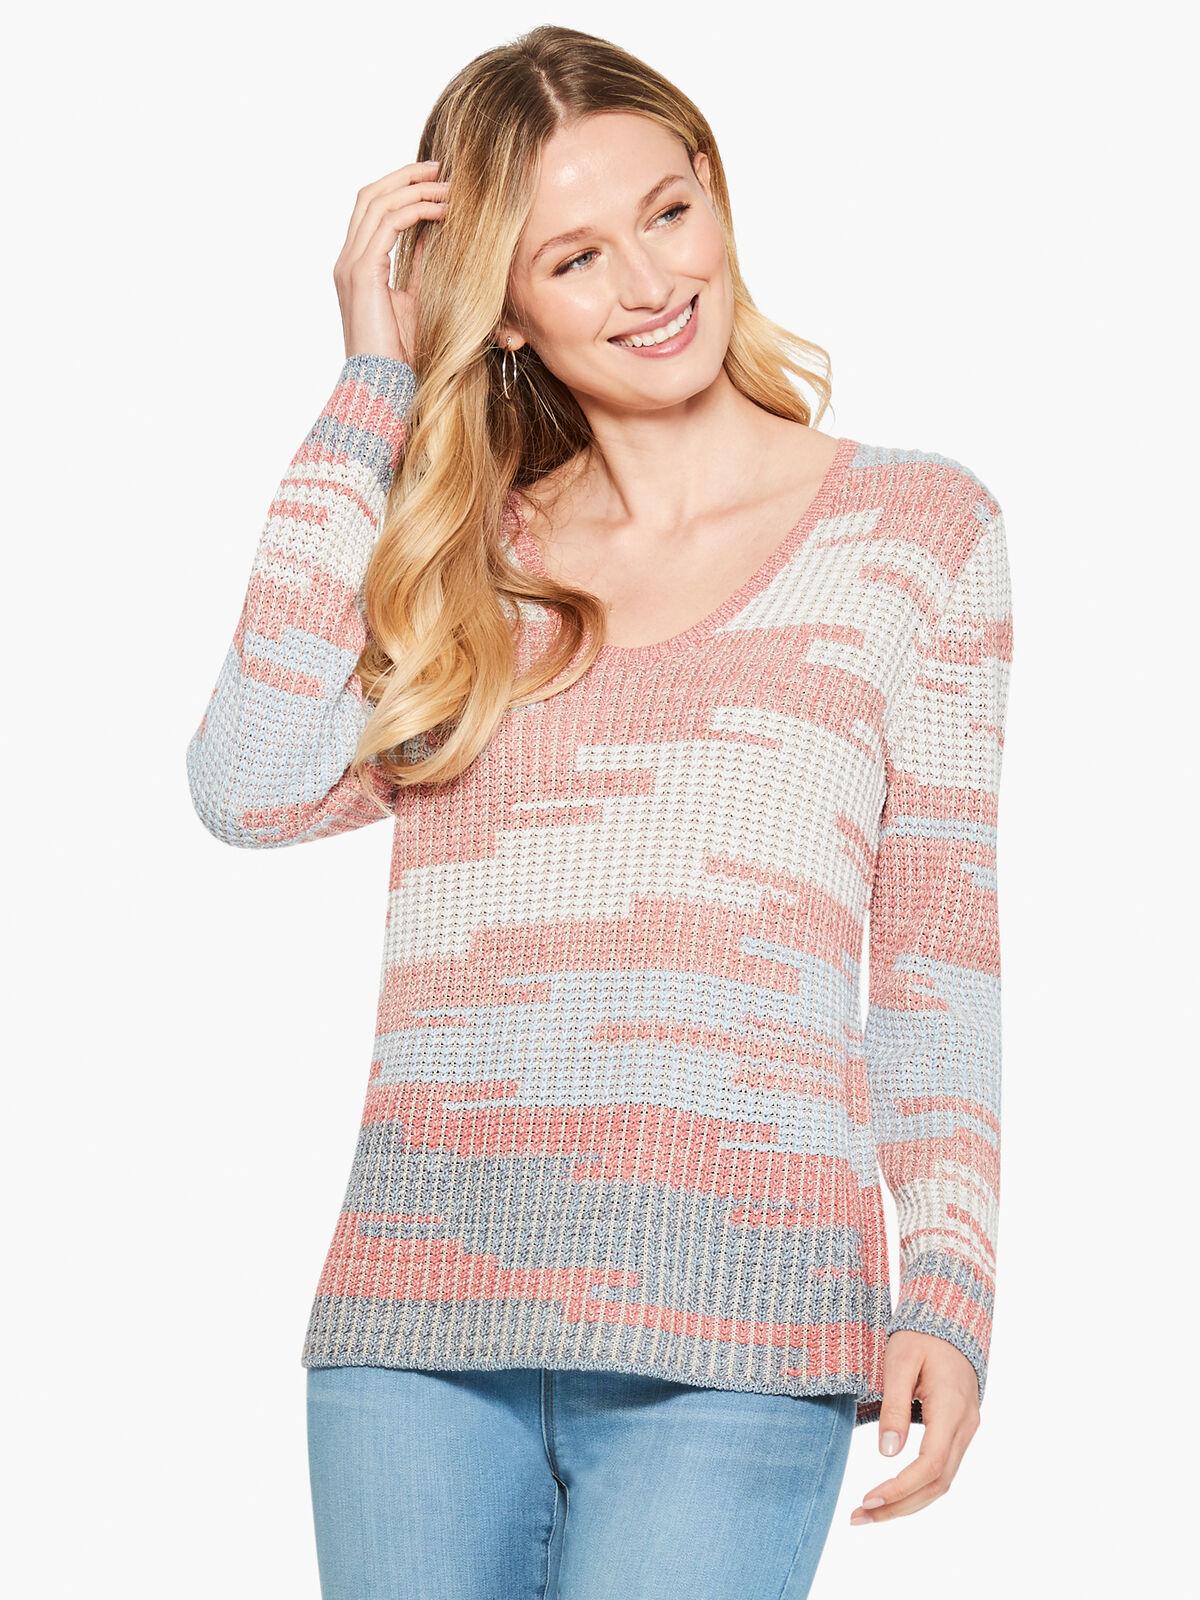 Terracotta Sky Sweater